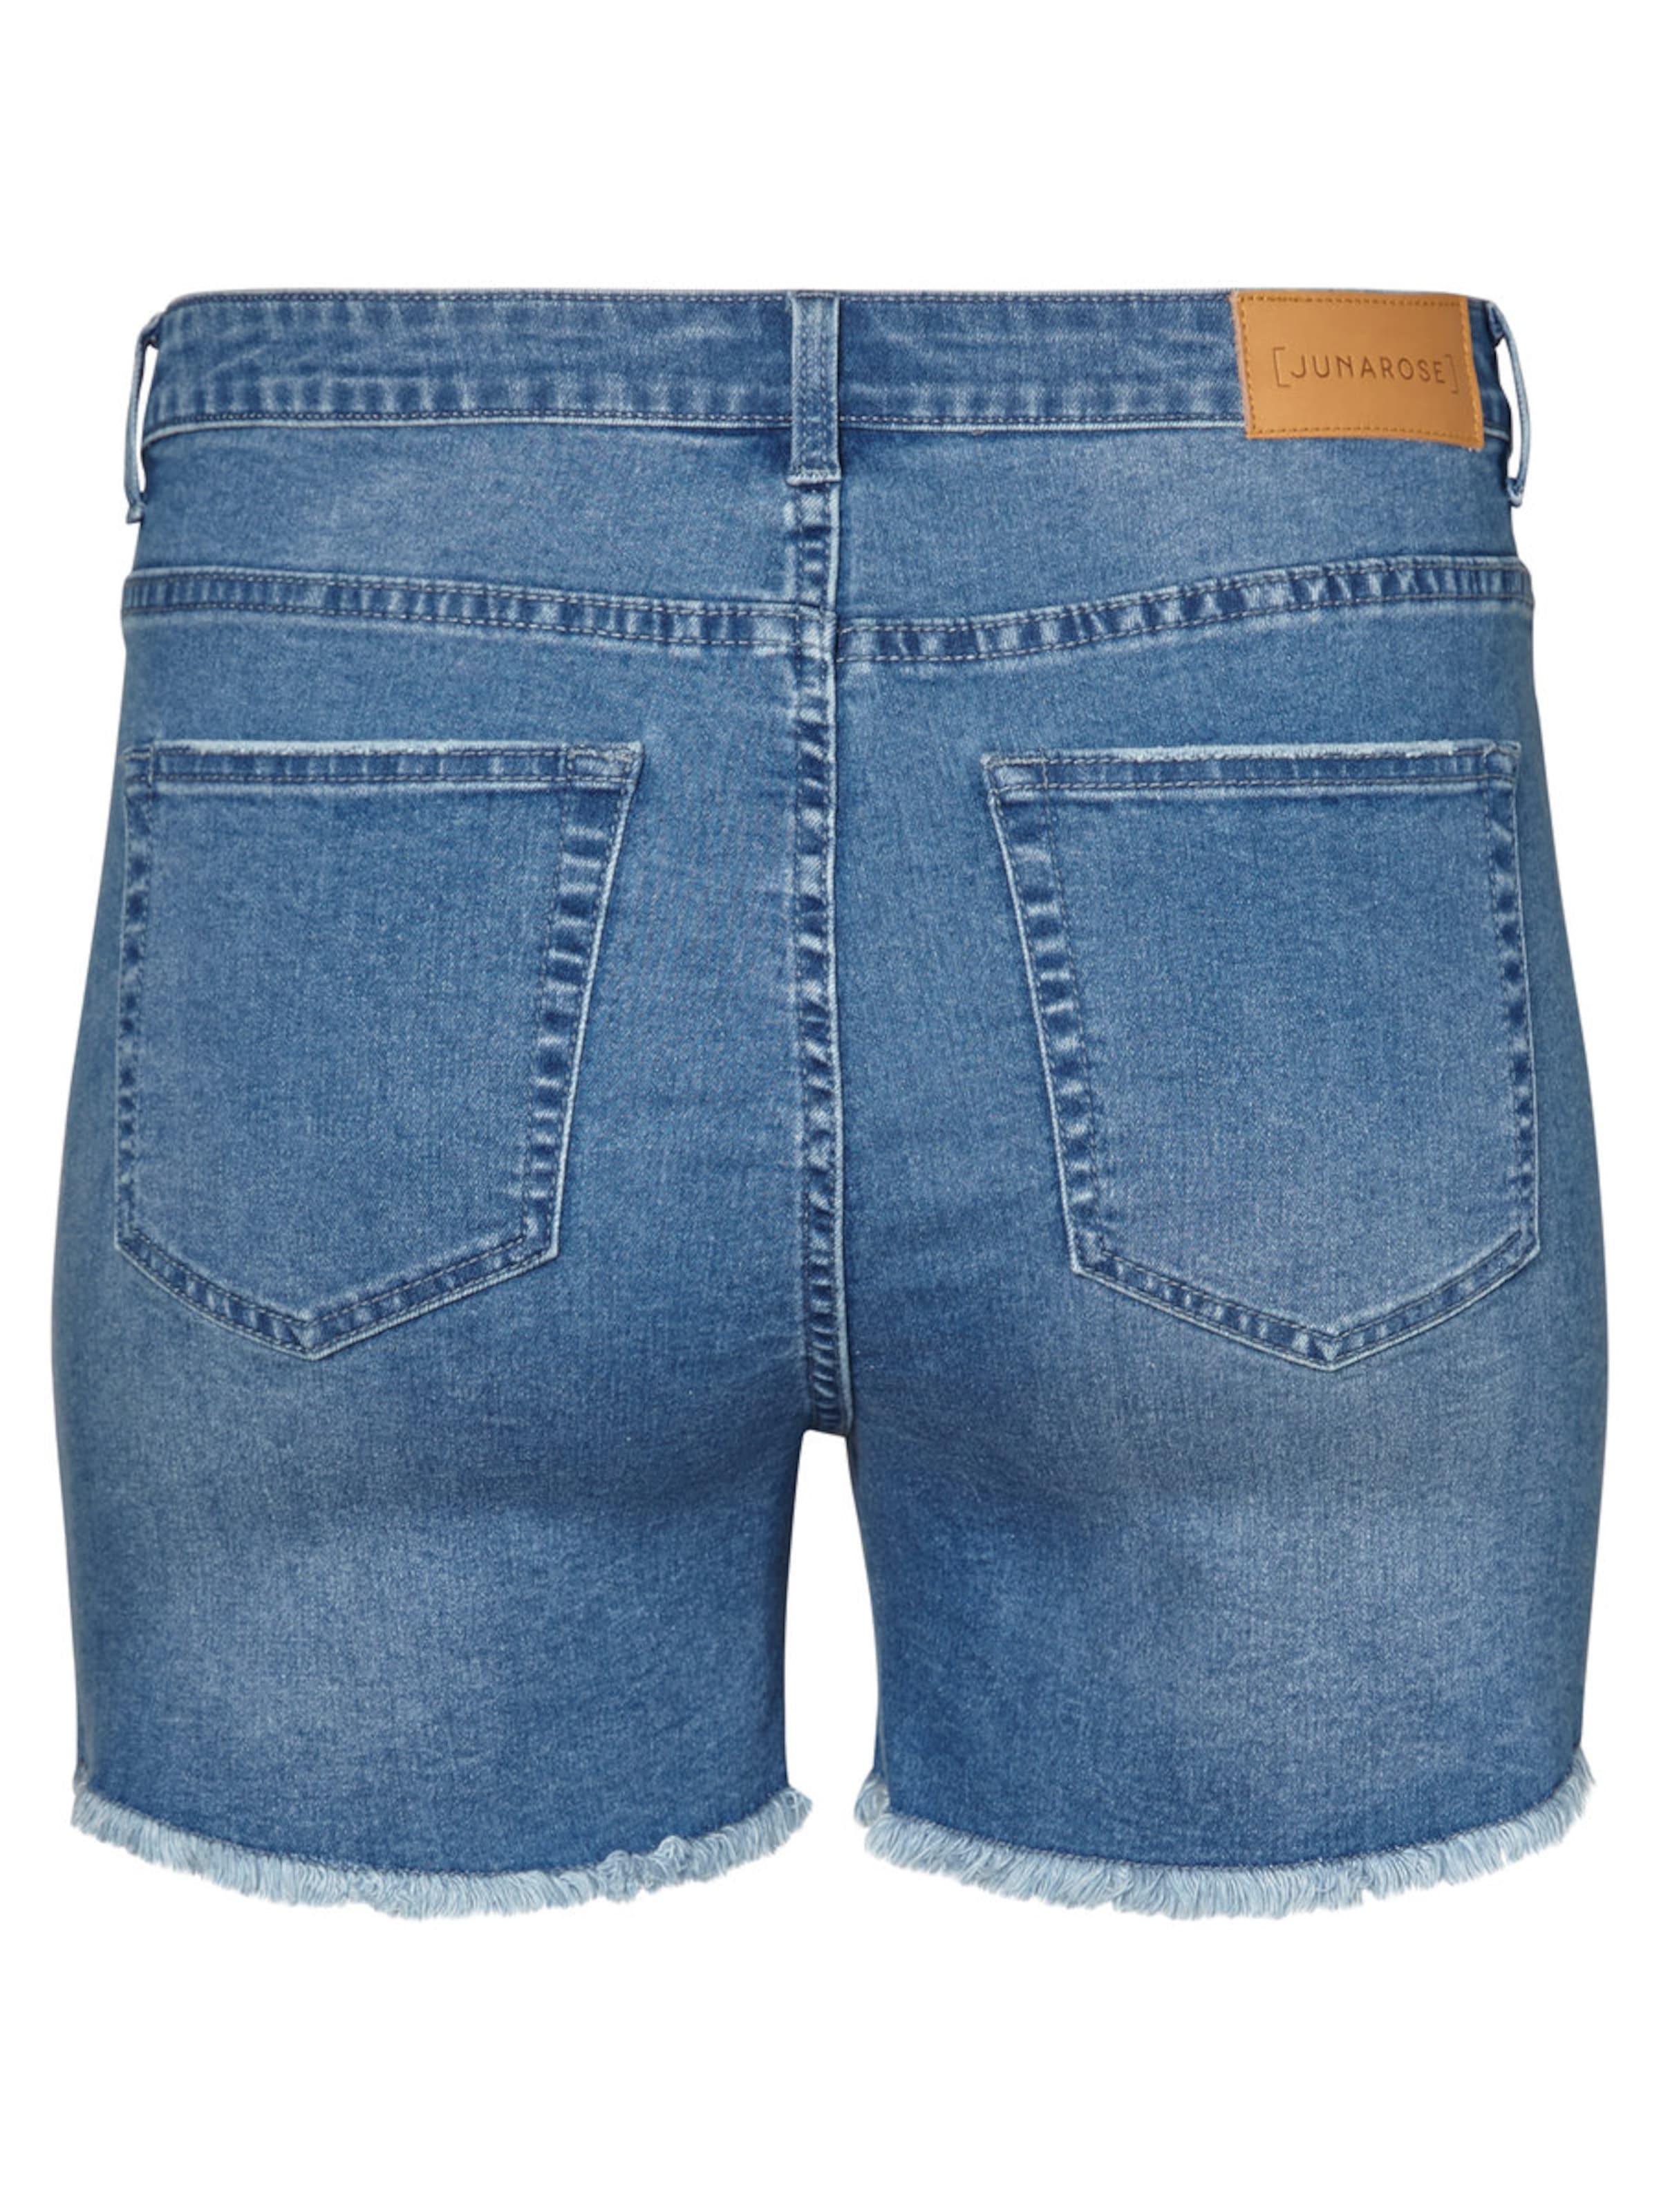 Junarose High Waist Denim Shorts Billig Mit Master Freies Verschiffen Outlet-Store J8qTHaUDZ